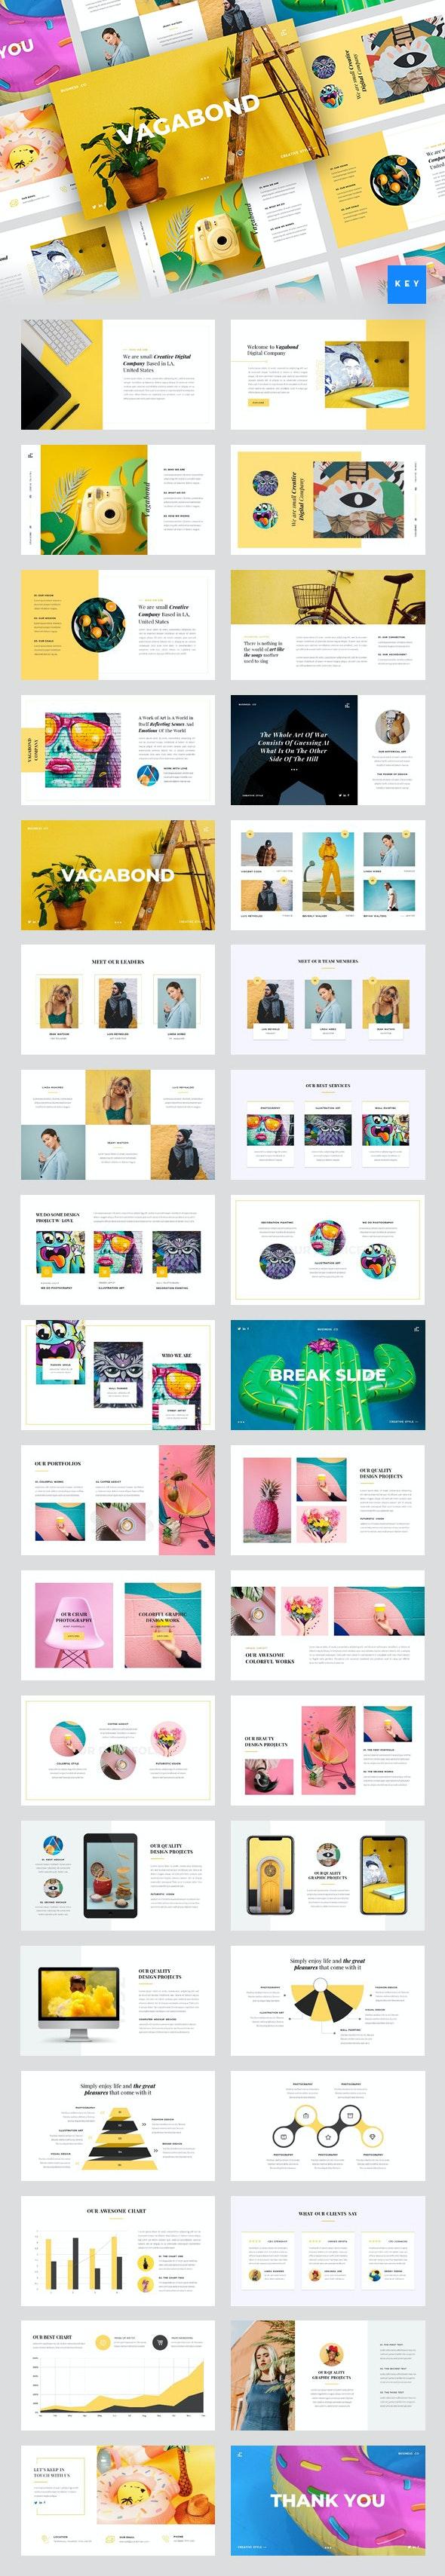 Vagabond - Creative & Business Keynote Template - Creative PowerPoint Templates